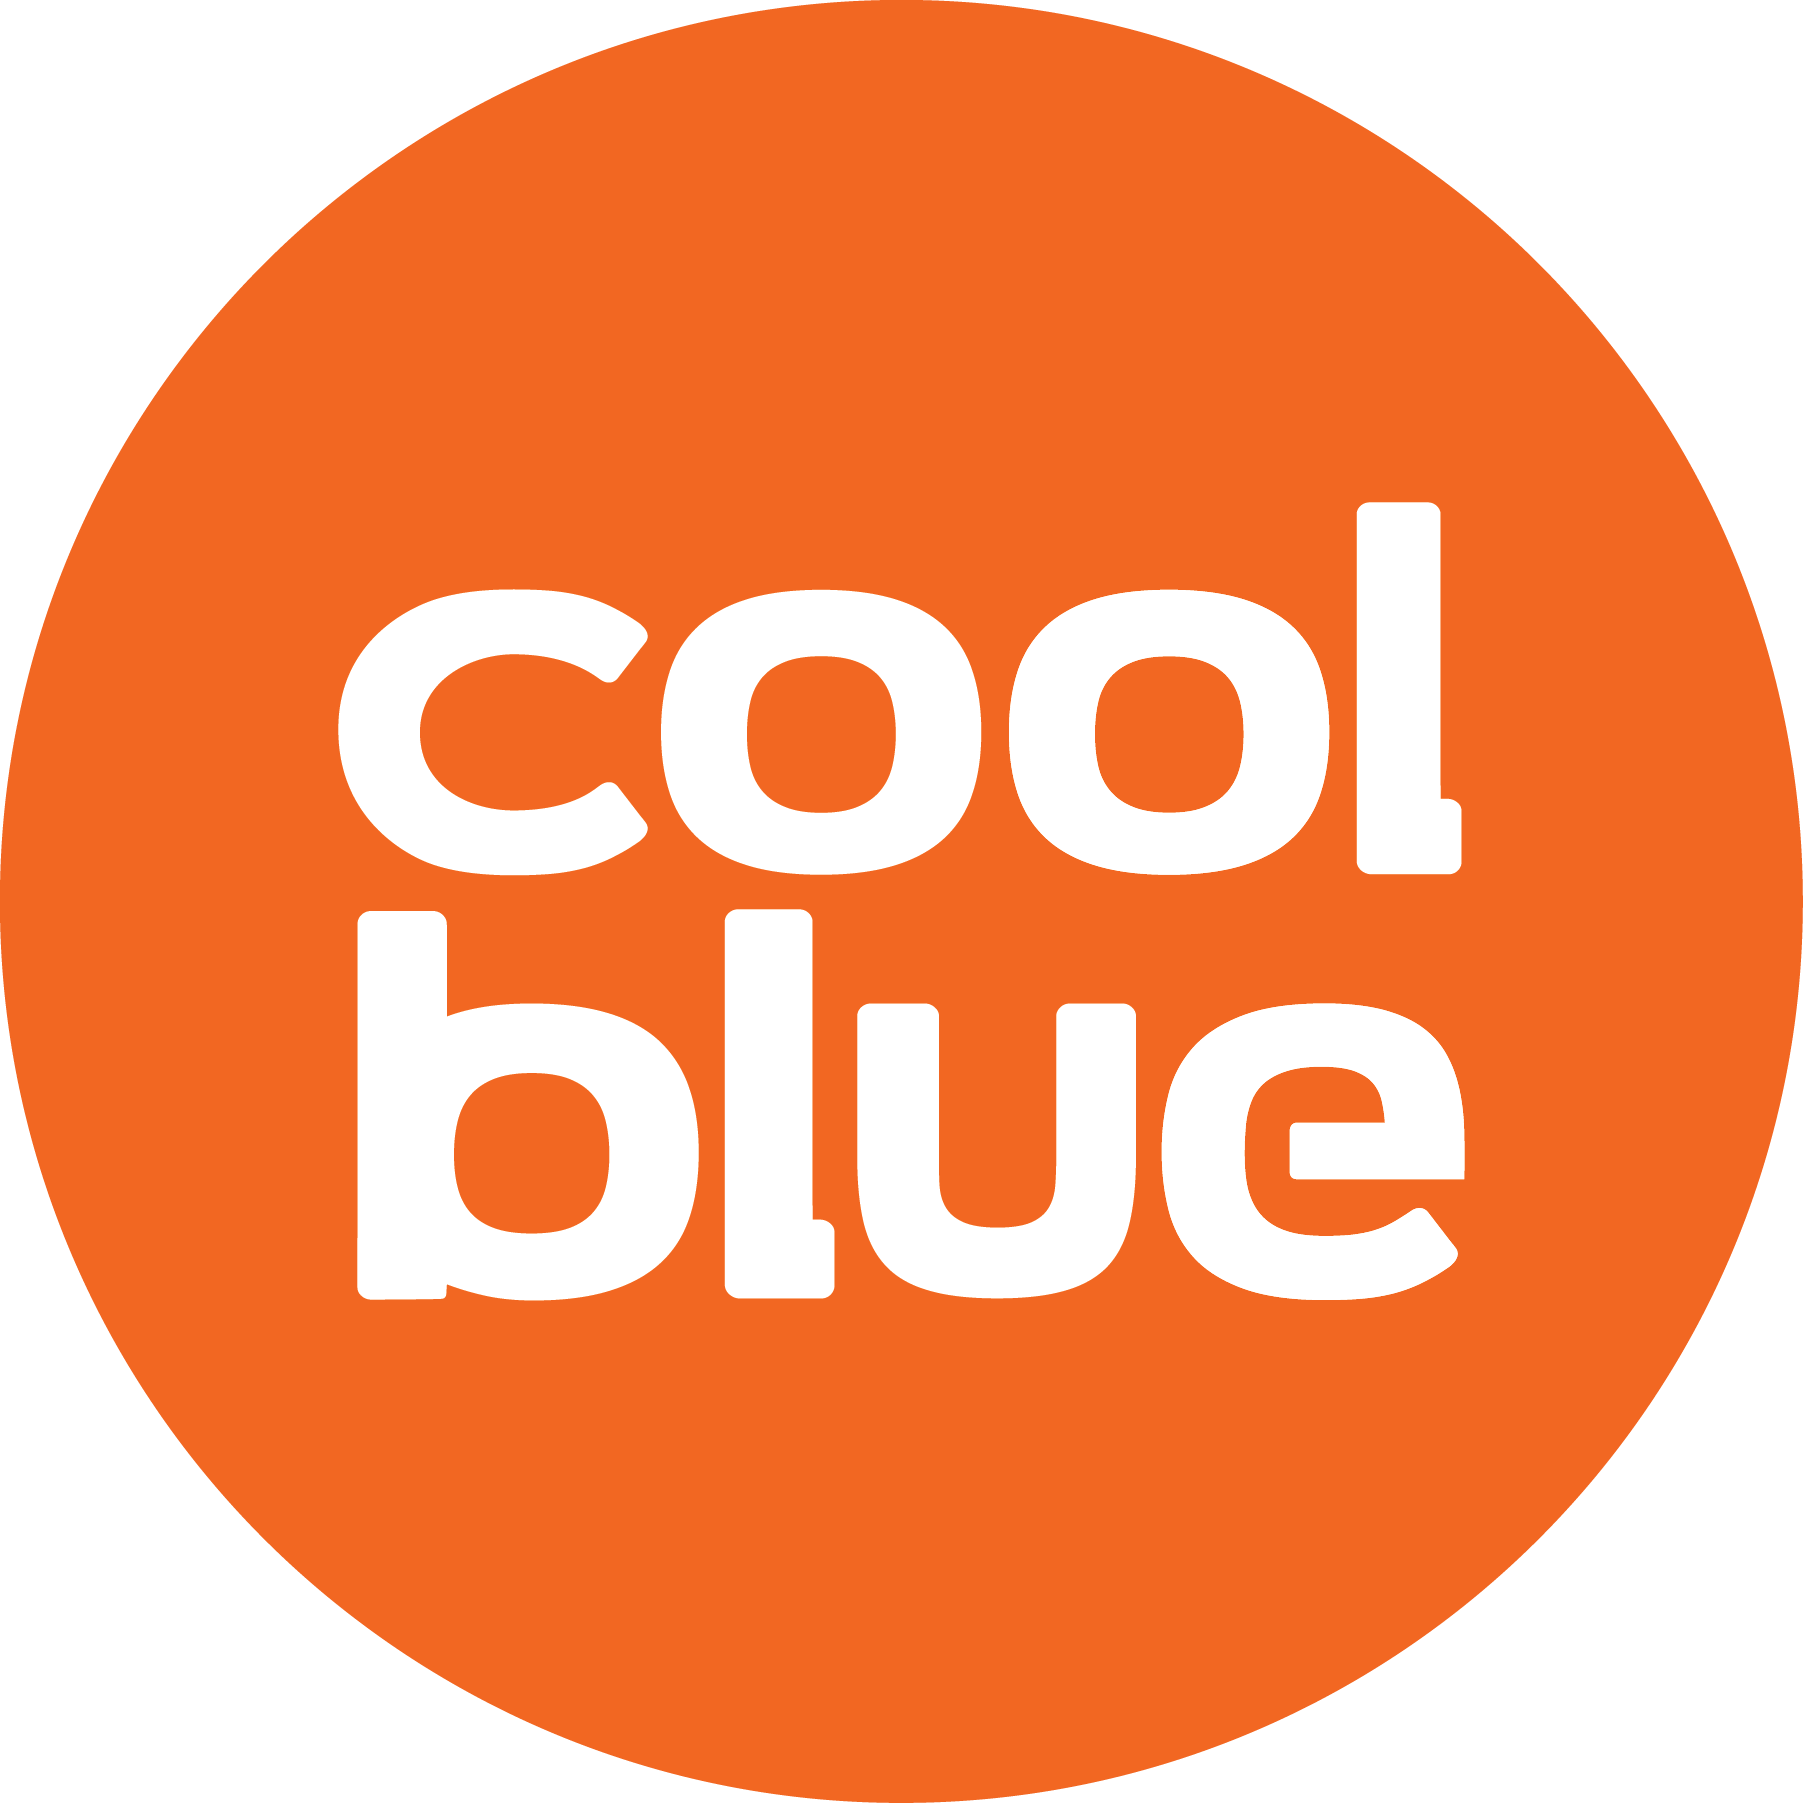 coolblue cadeaubon nieuwsbrief